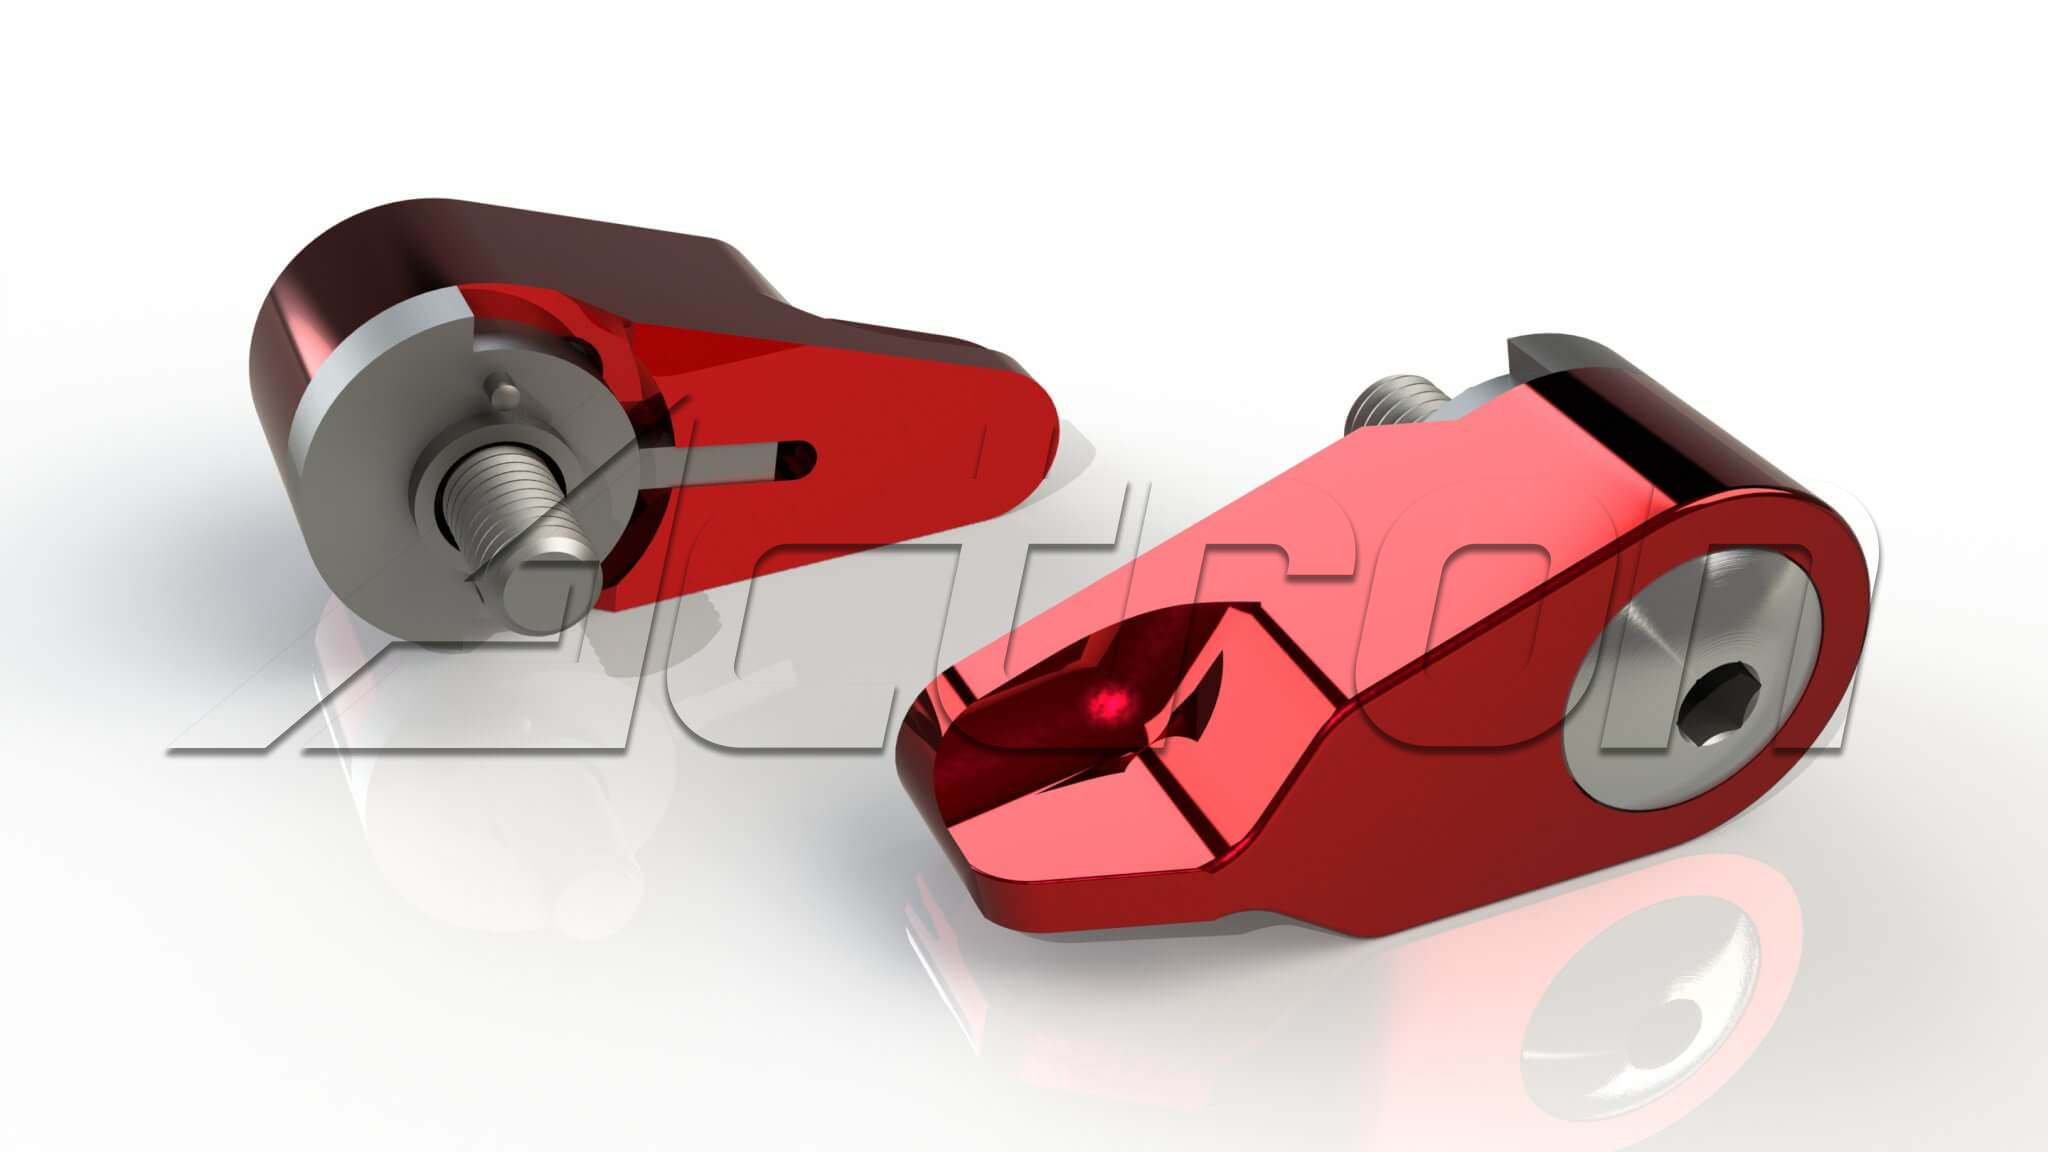 1-4-turn-retainer-4649-a35647.jpg